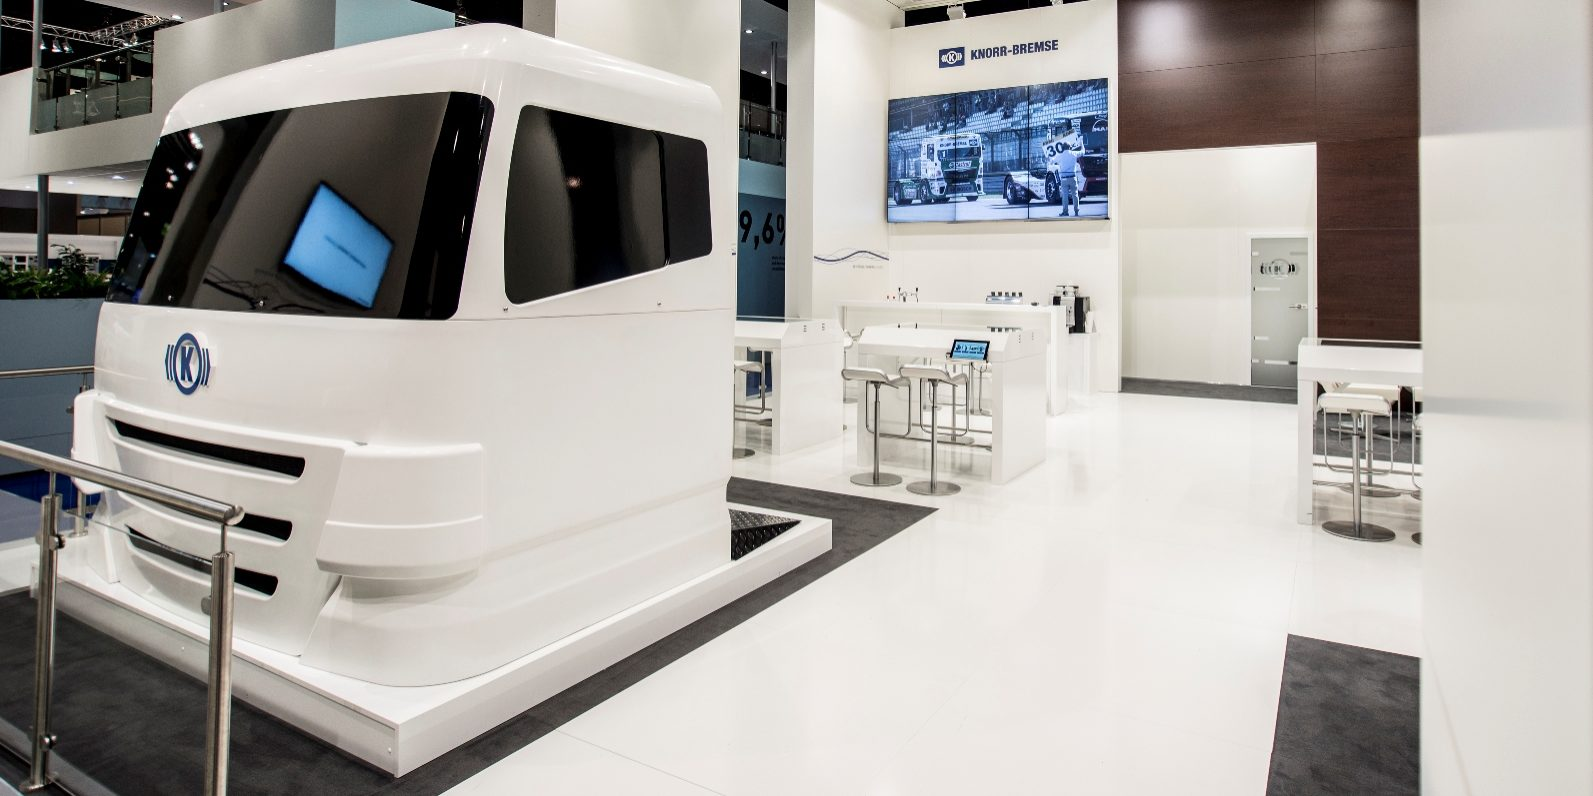 Knorr Bremse – Automechanika 2014